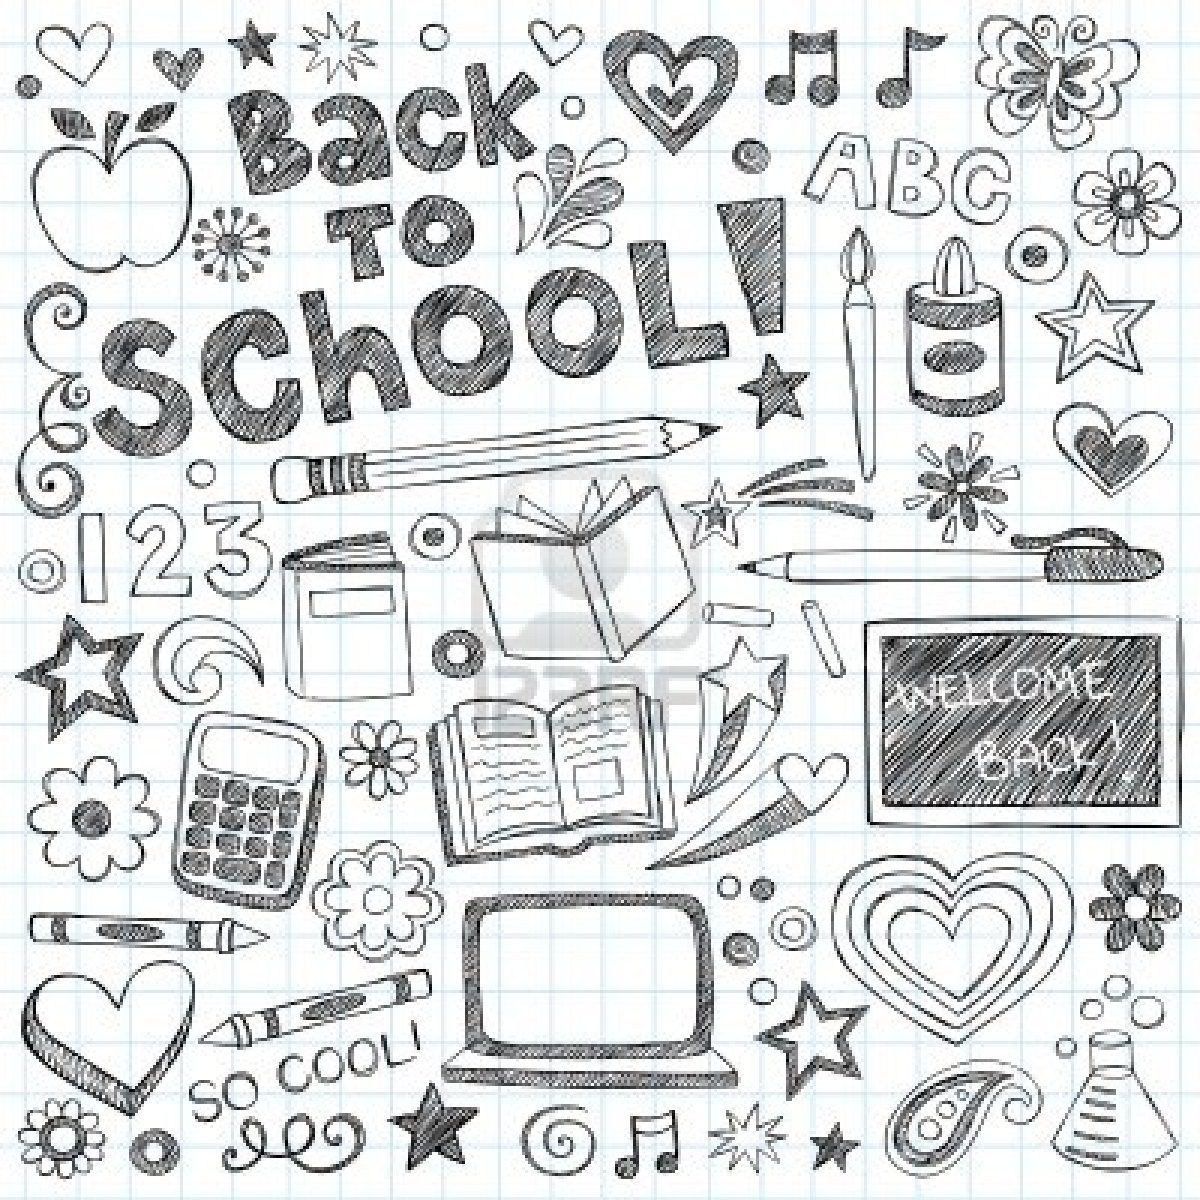 Notebook Doodles, Doodles, How To Draw Hands